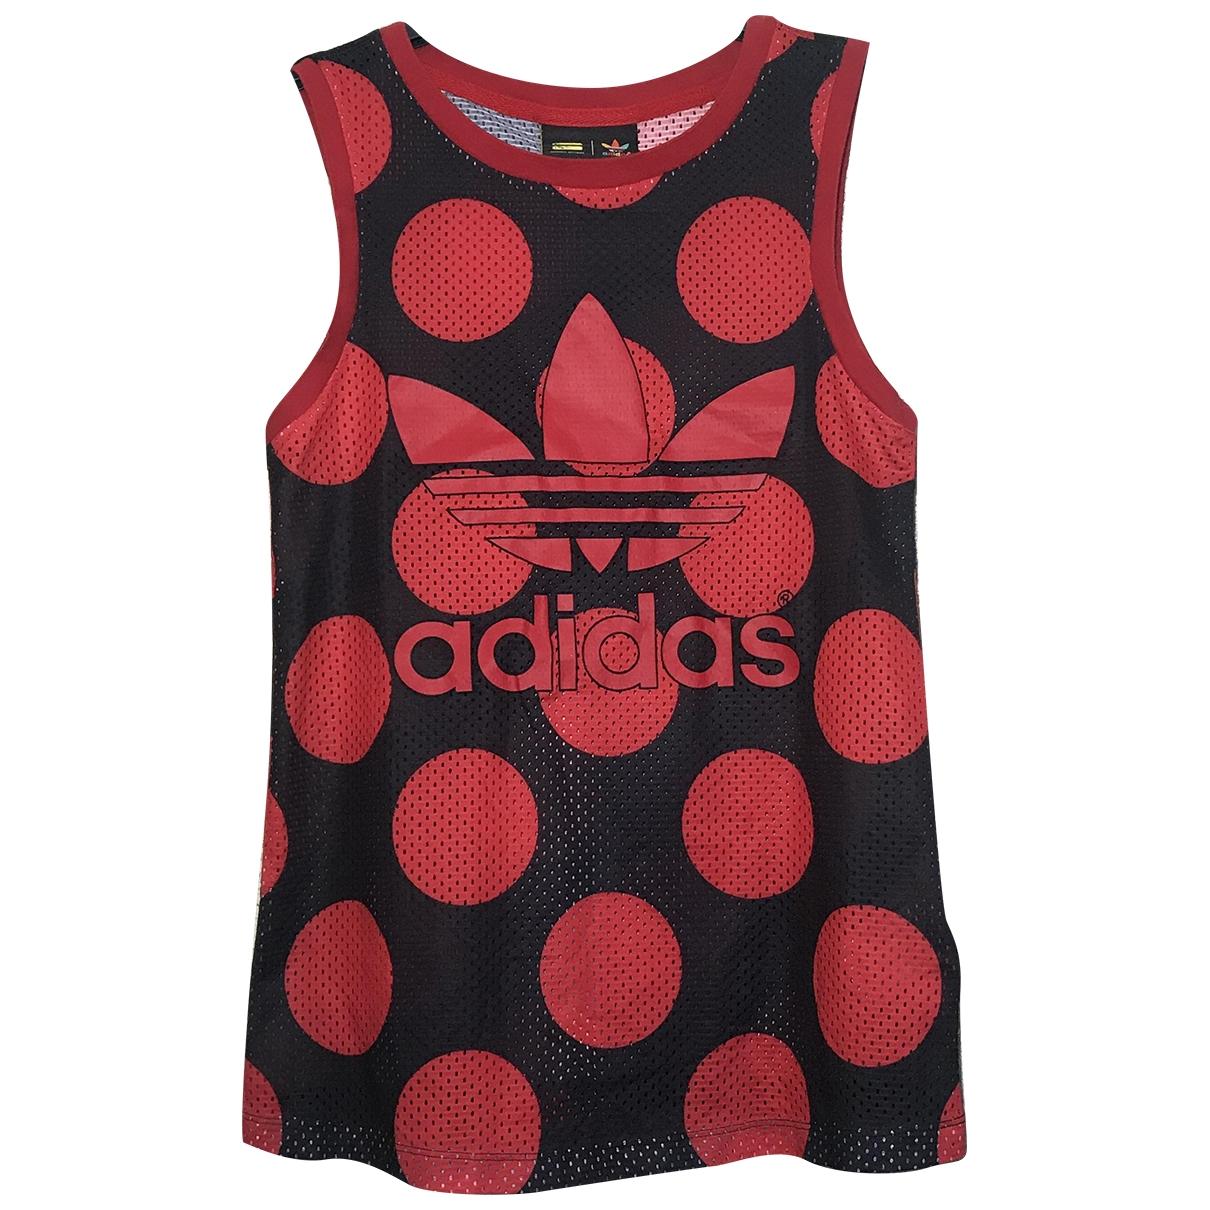 Adidas X Pharrell Williams \N Multicolour  top for Women 34 FR